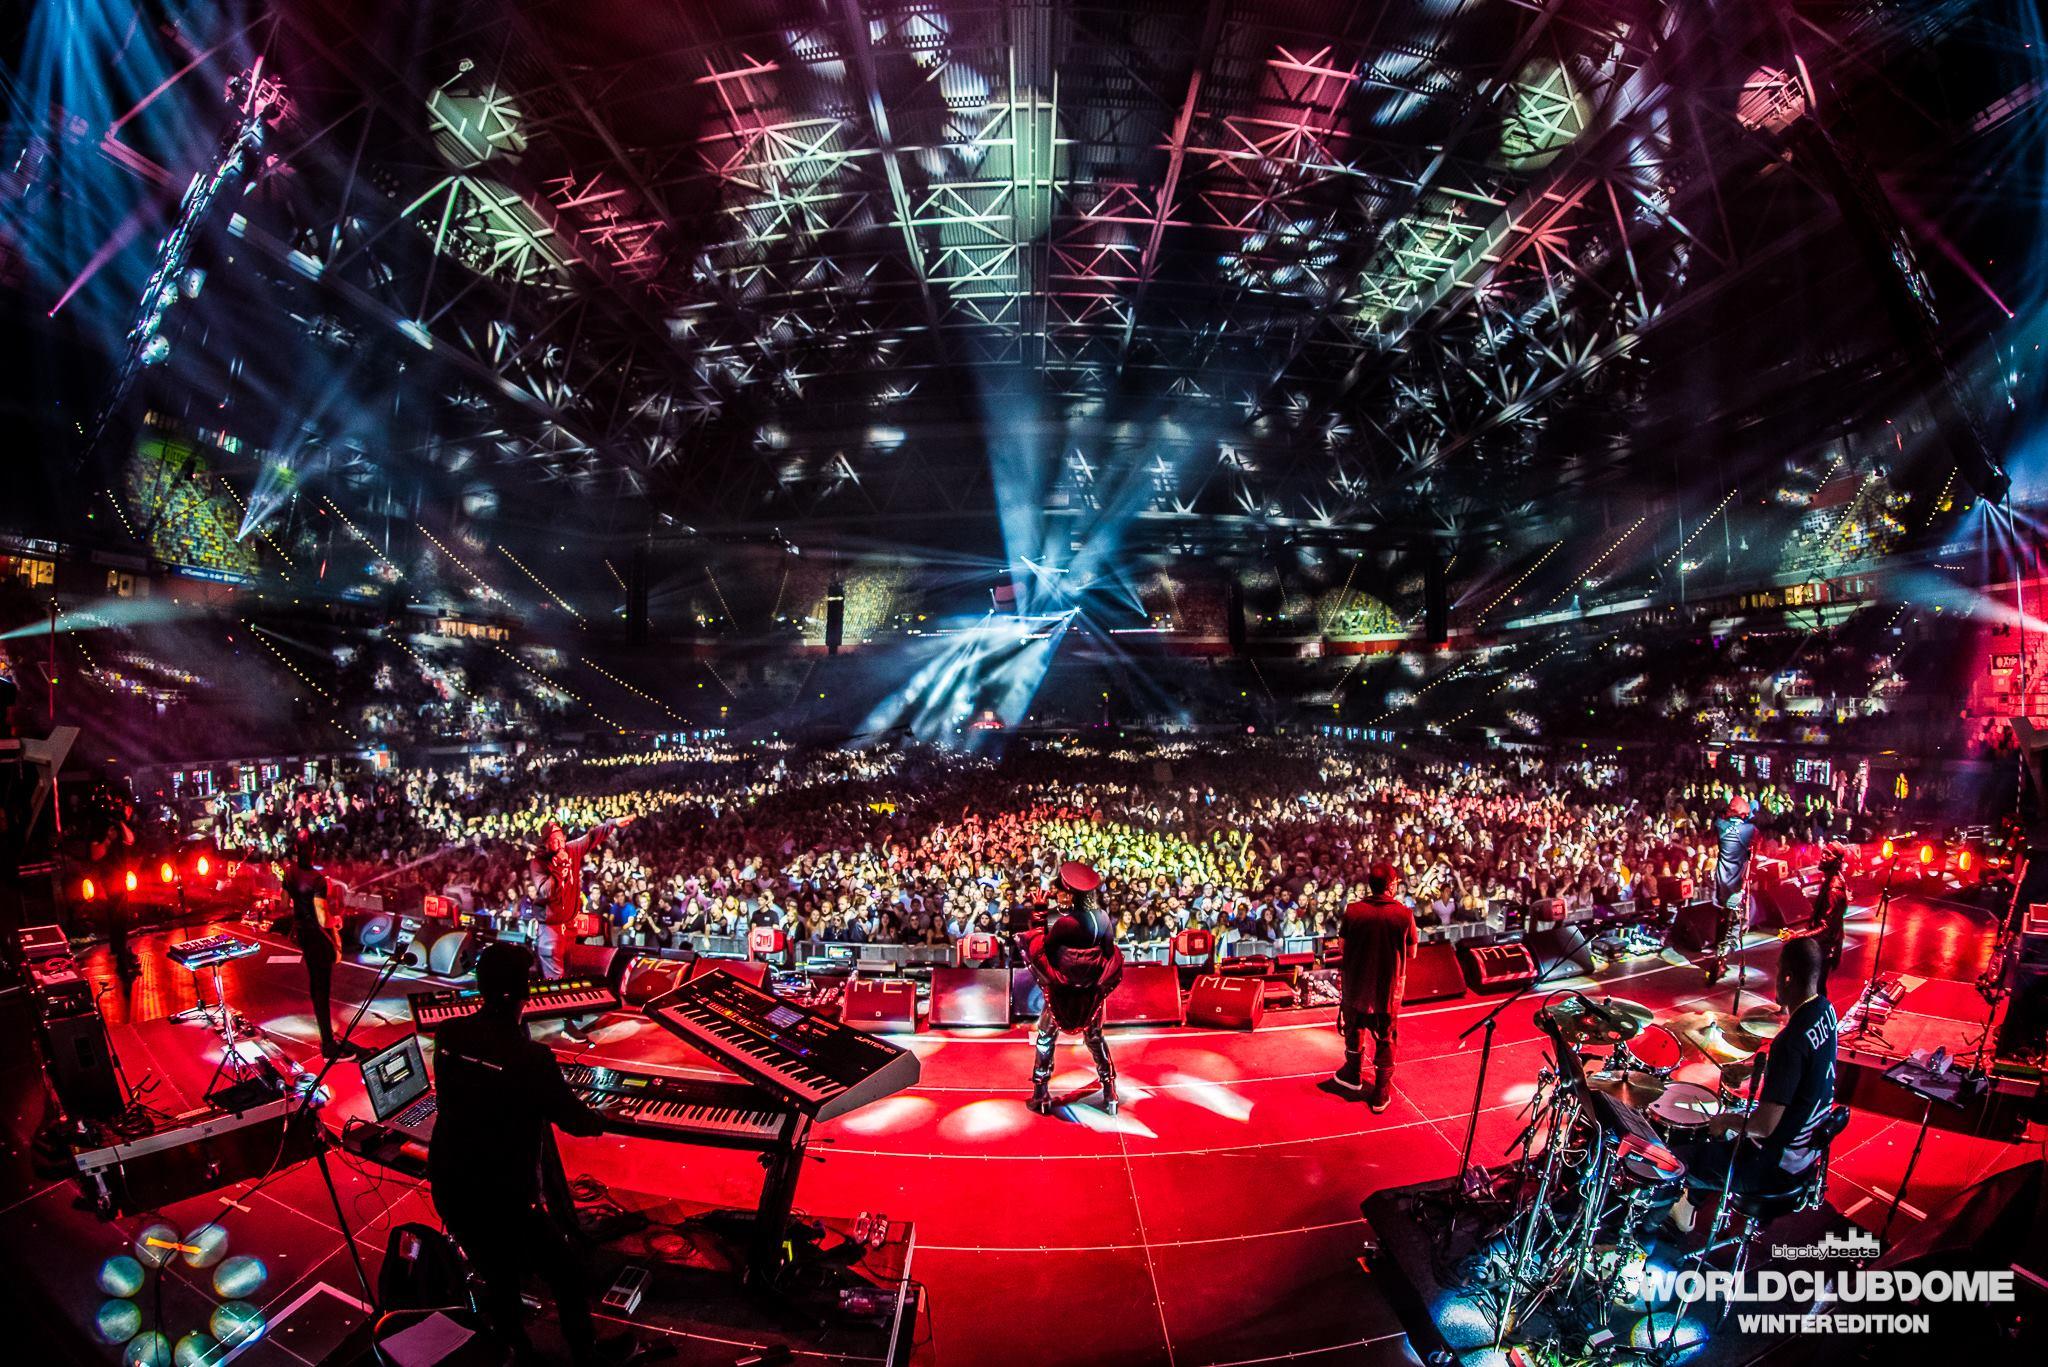 World Club Dome Winter Edition Black Eyed Peas